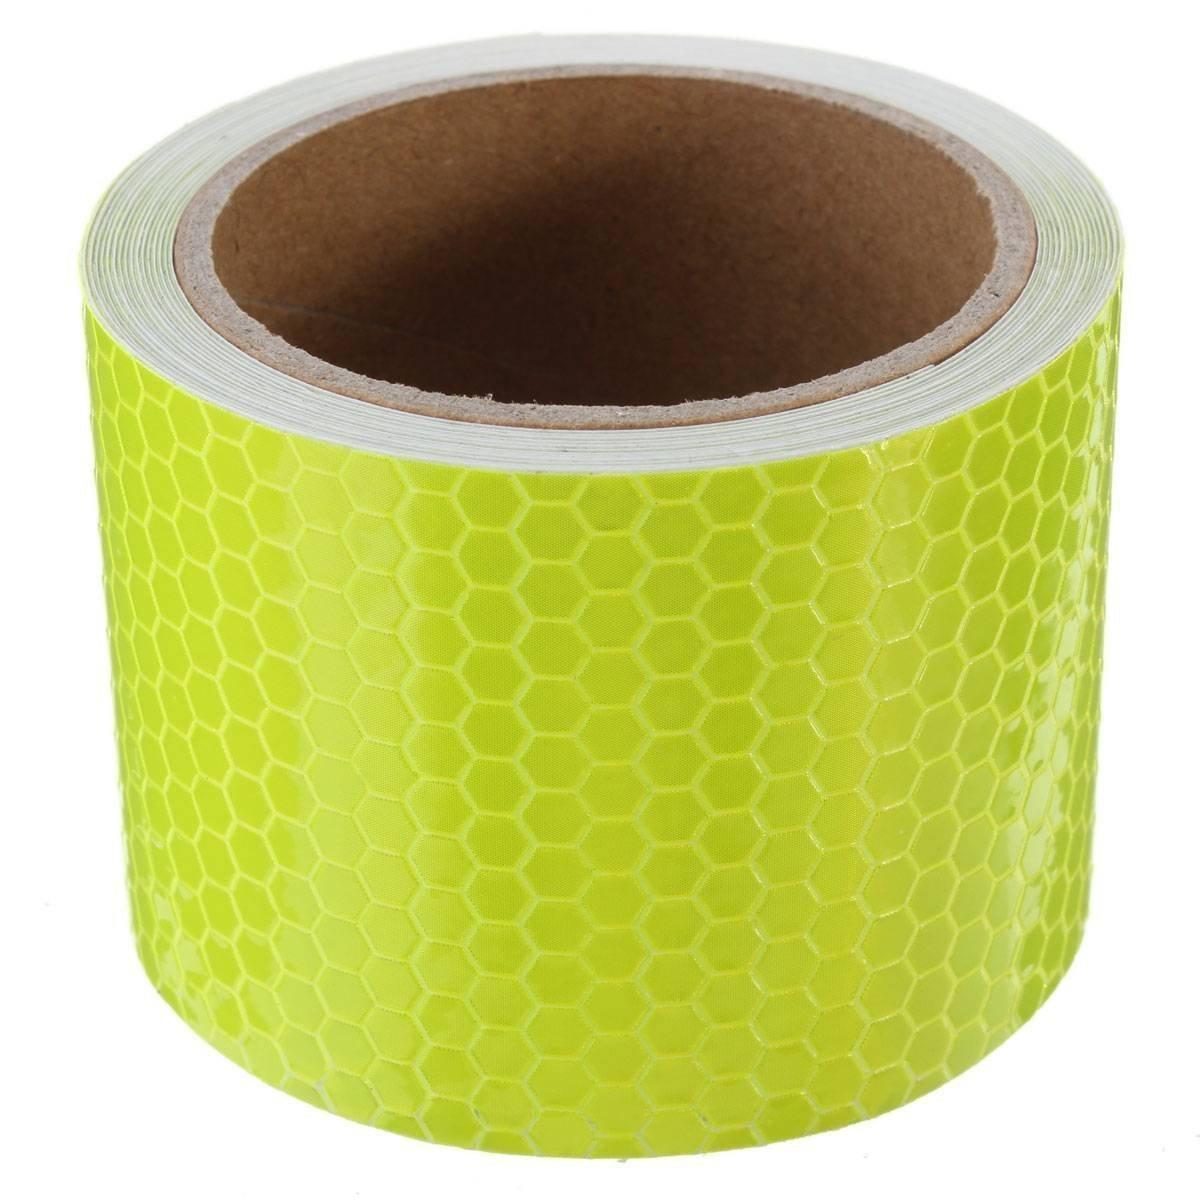 Tuqiang® - Cinta adhesiva reflectante de seguridad.Banda reflectante (5cm x 3m) color amarillo Muchkey